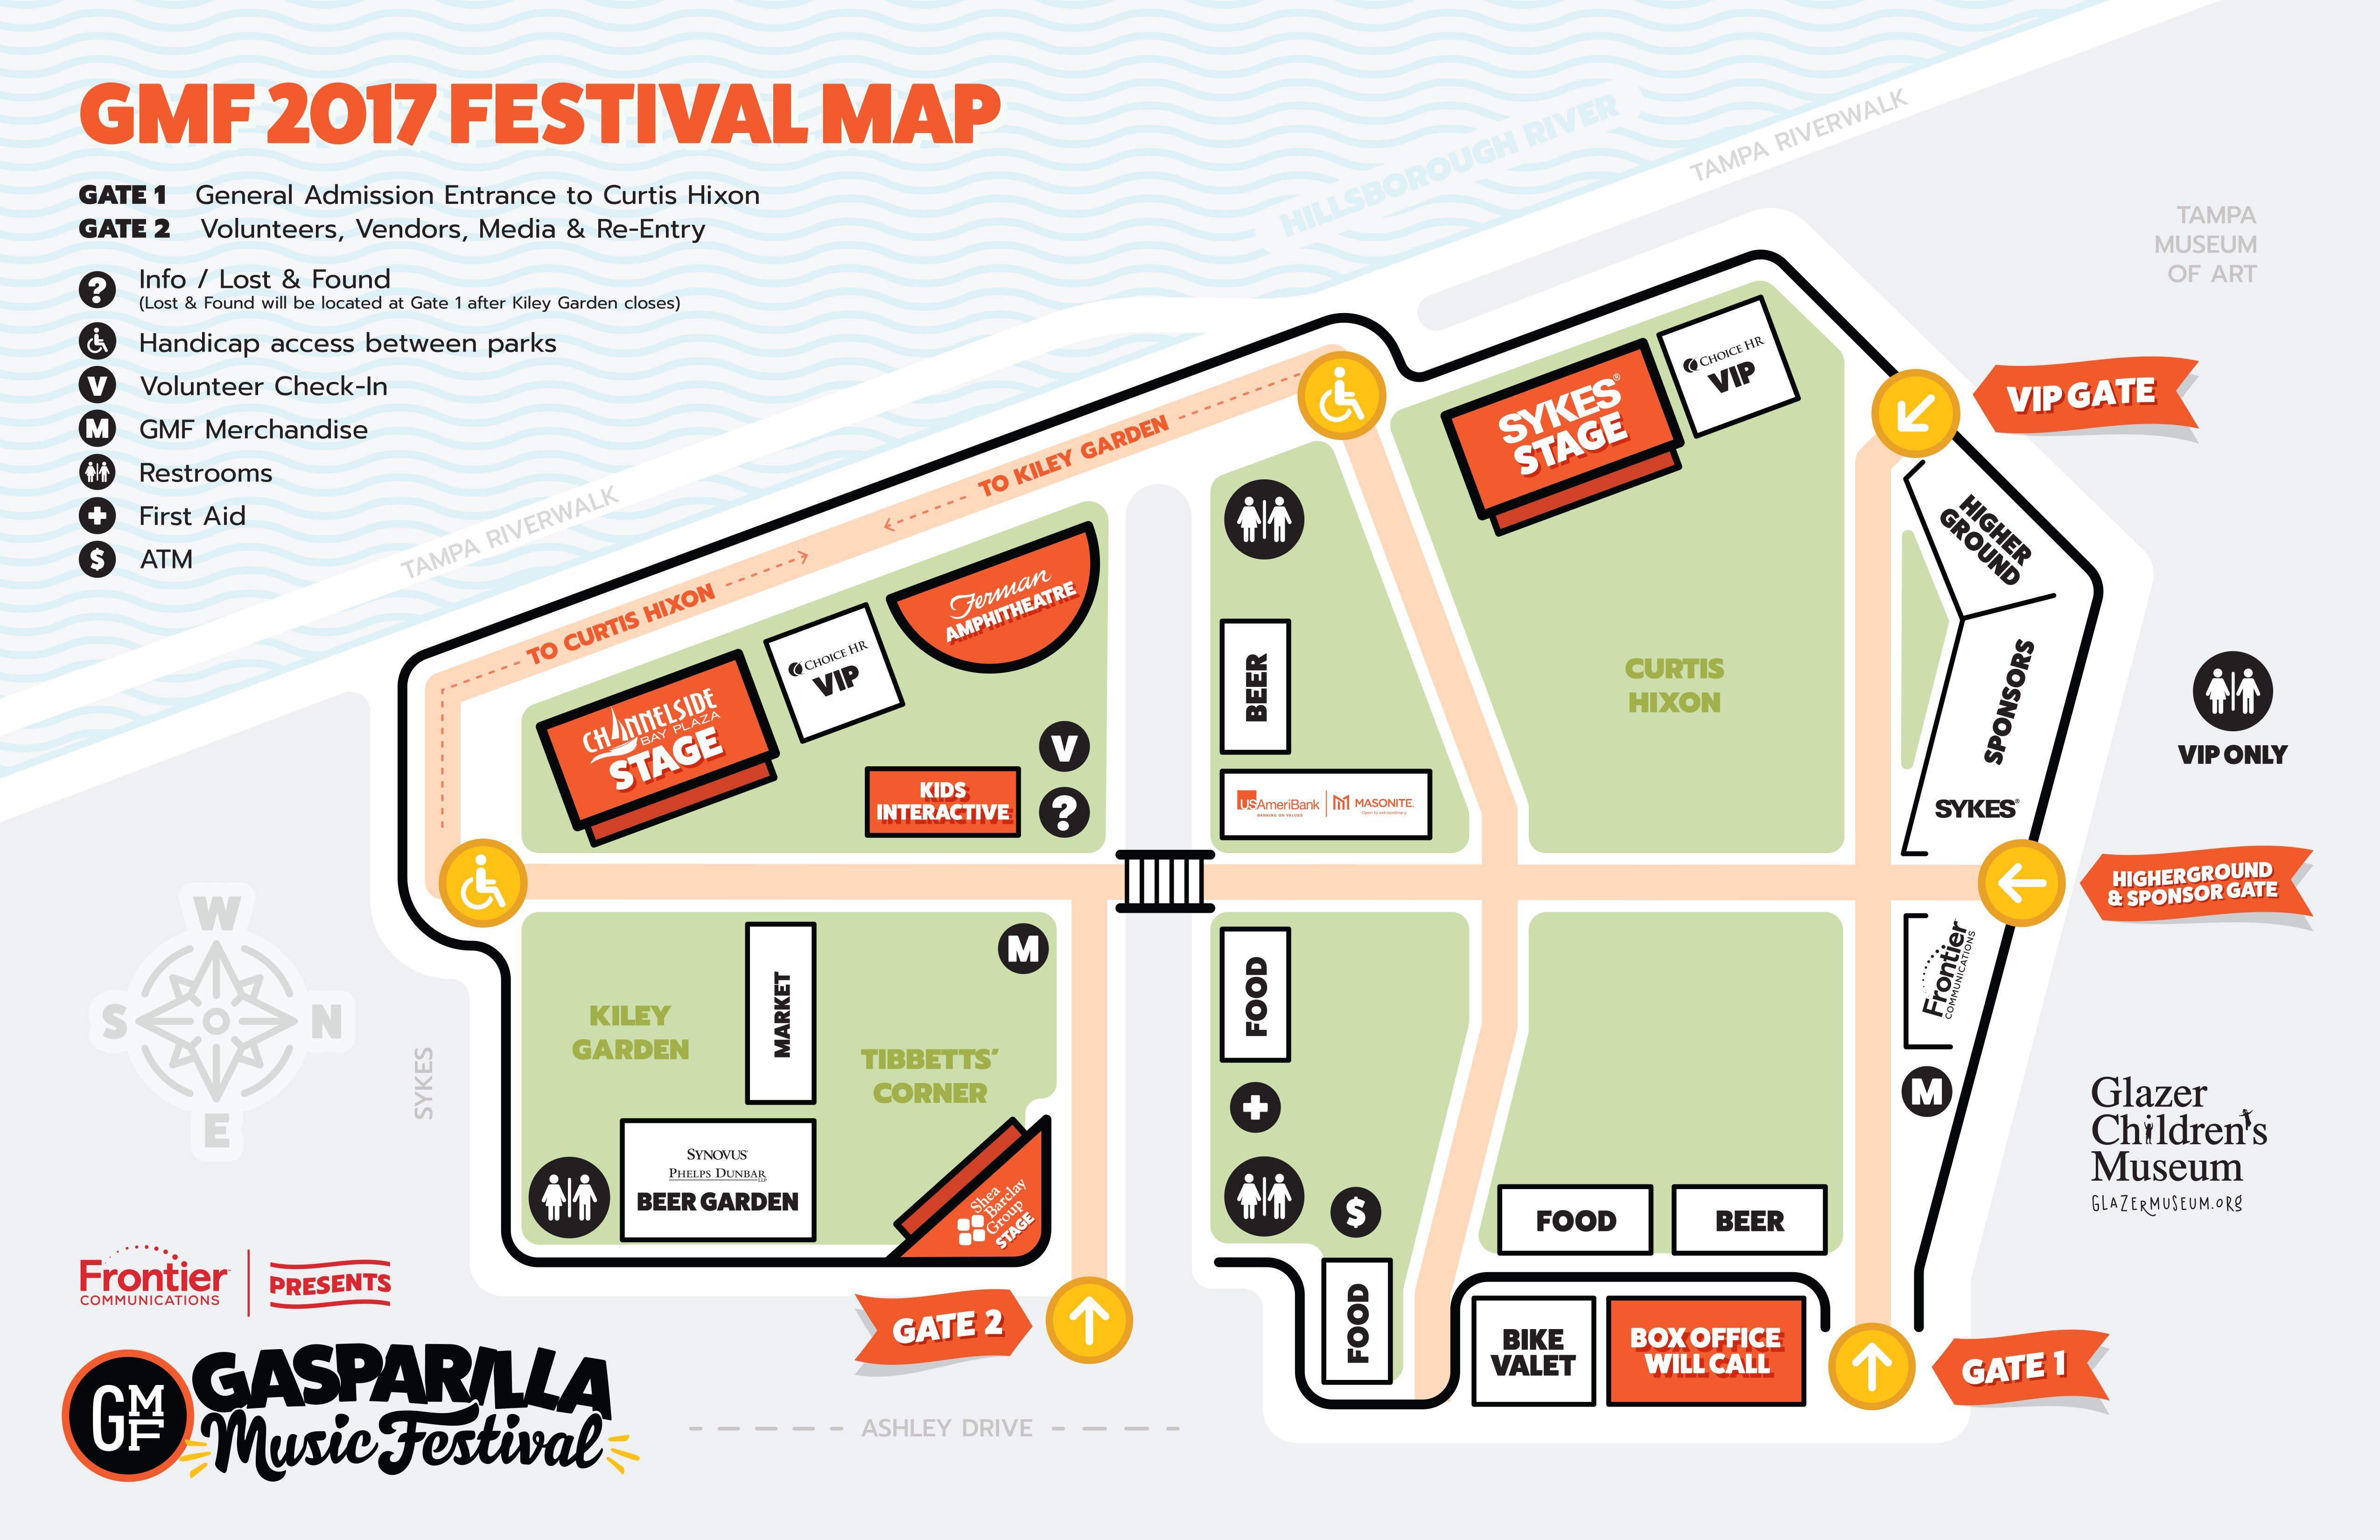 gmf2017-sitemap-11x17